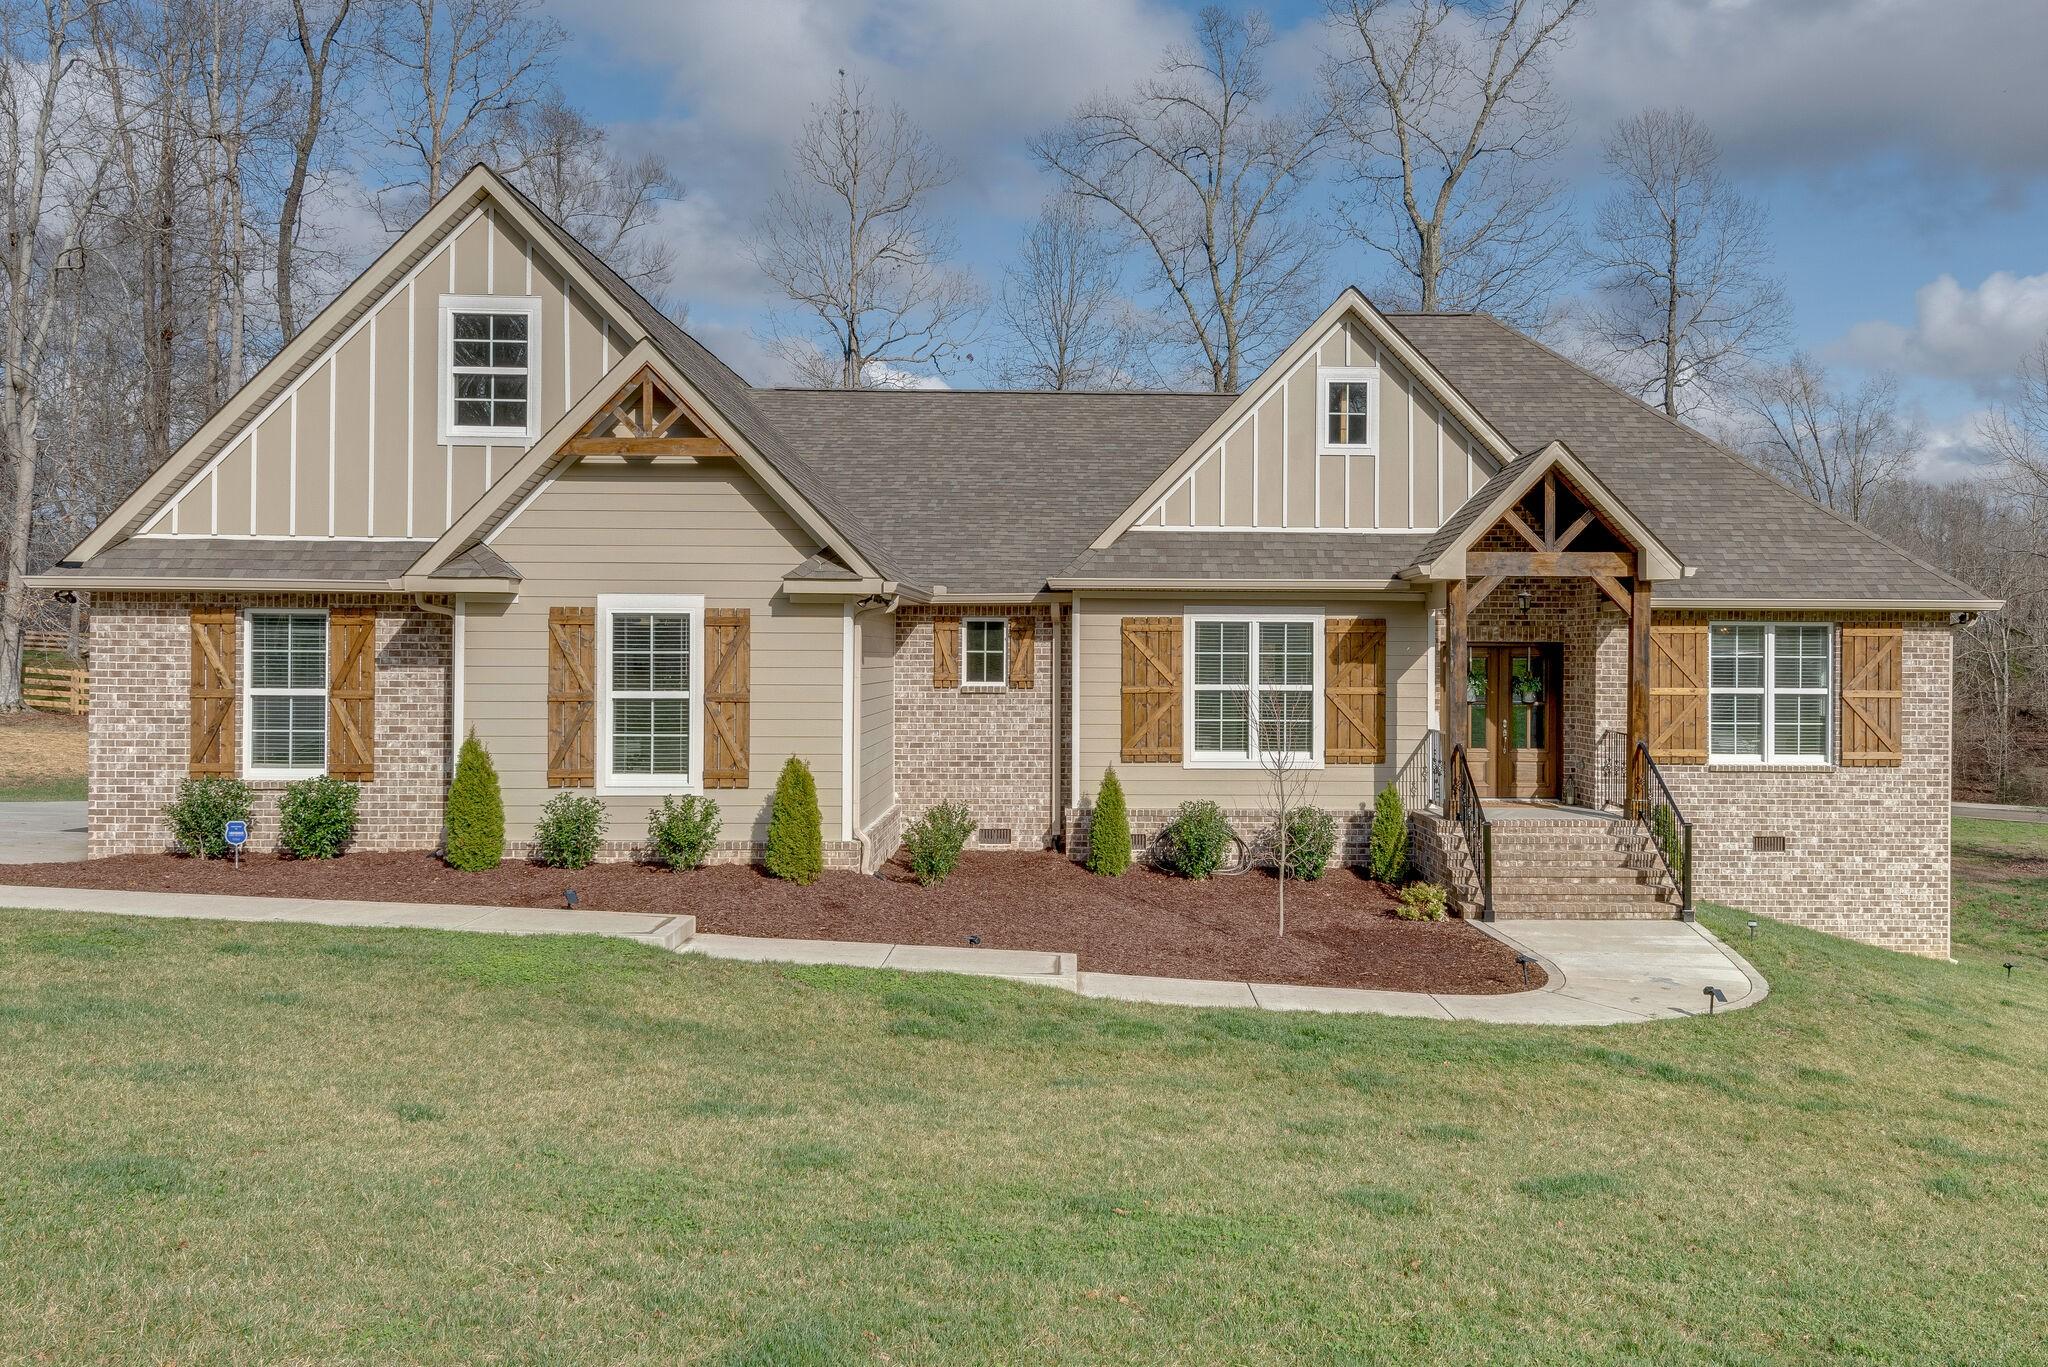 505 Aberdeen Way Property Photo - Burns, TN real estate listing